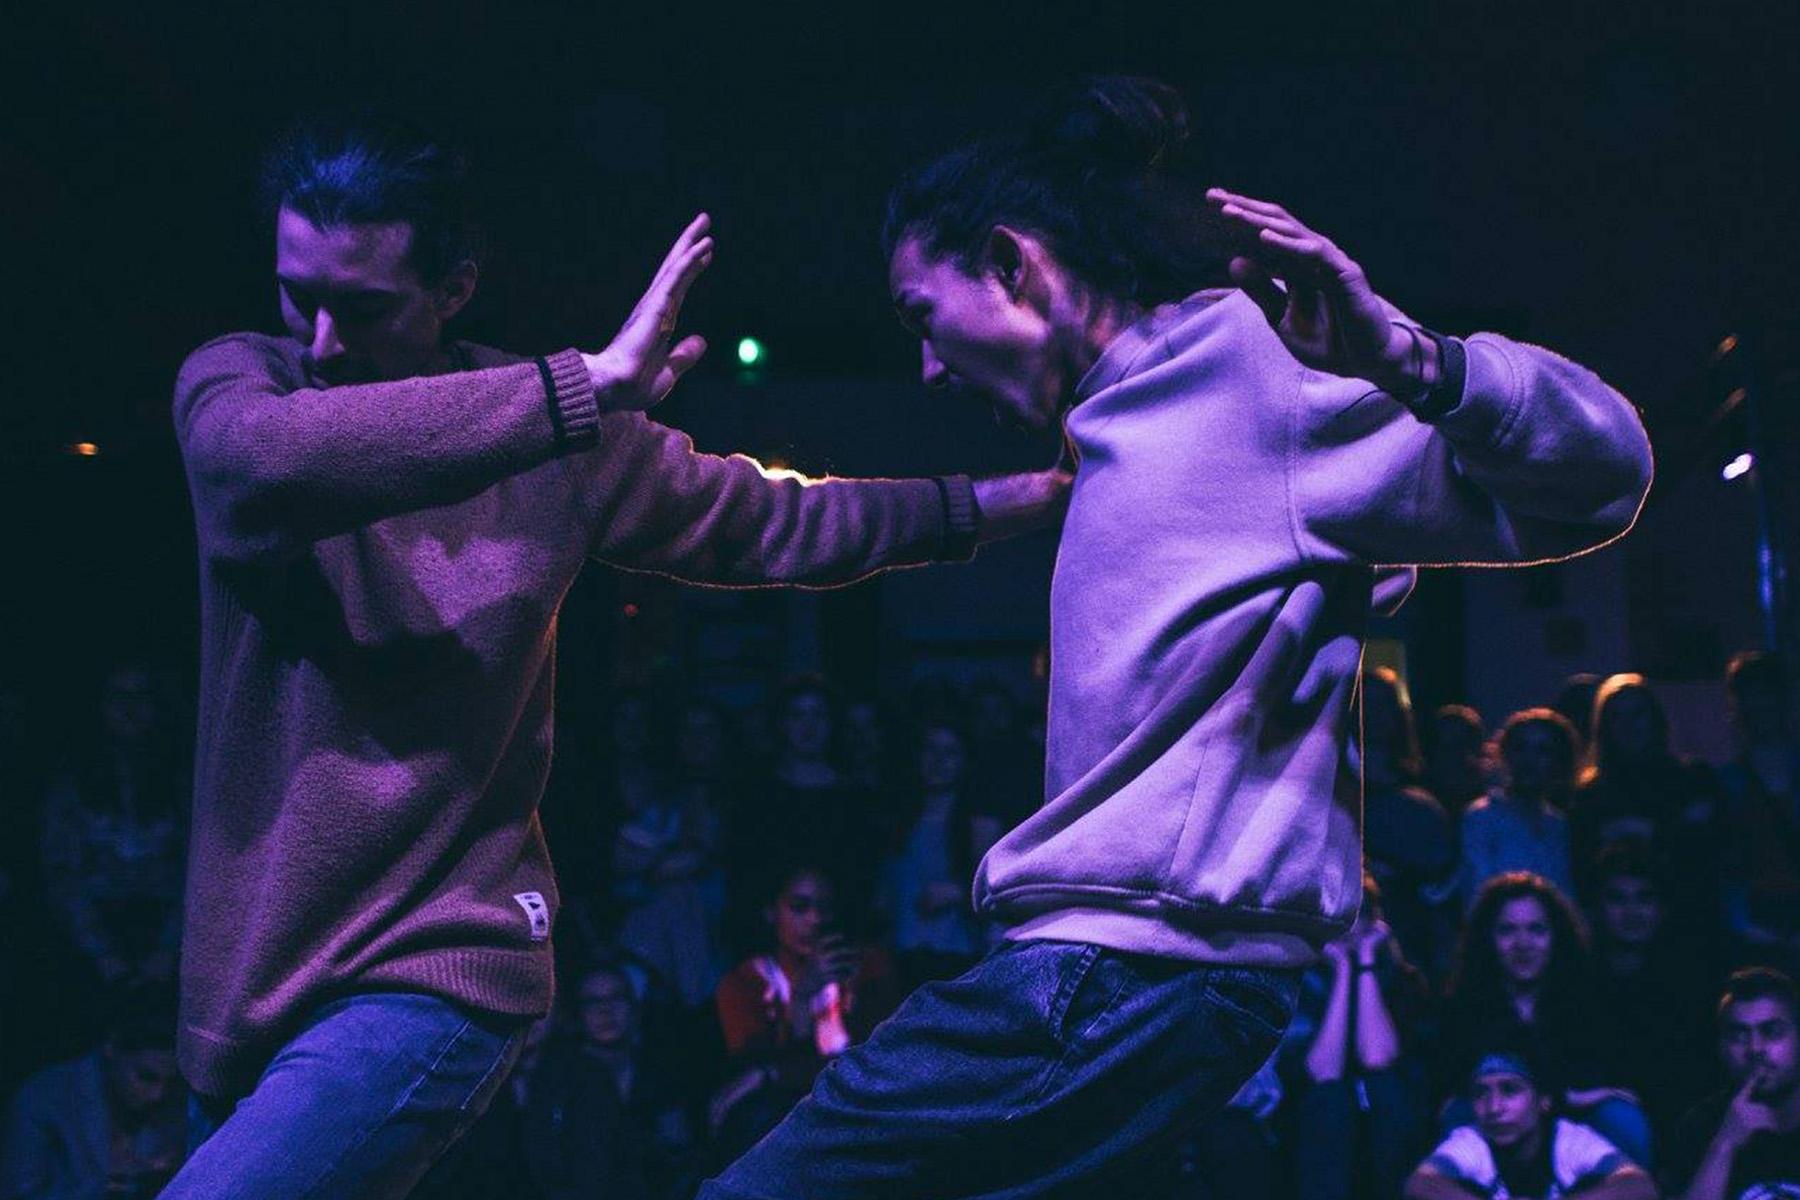 kurs_house_dance_meme_emanuele_bodo